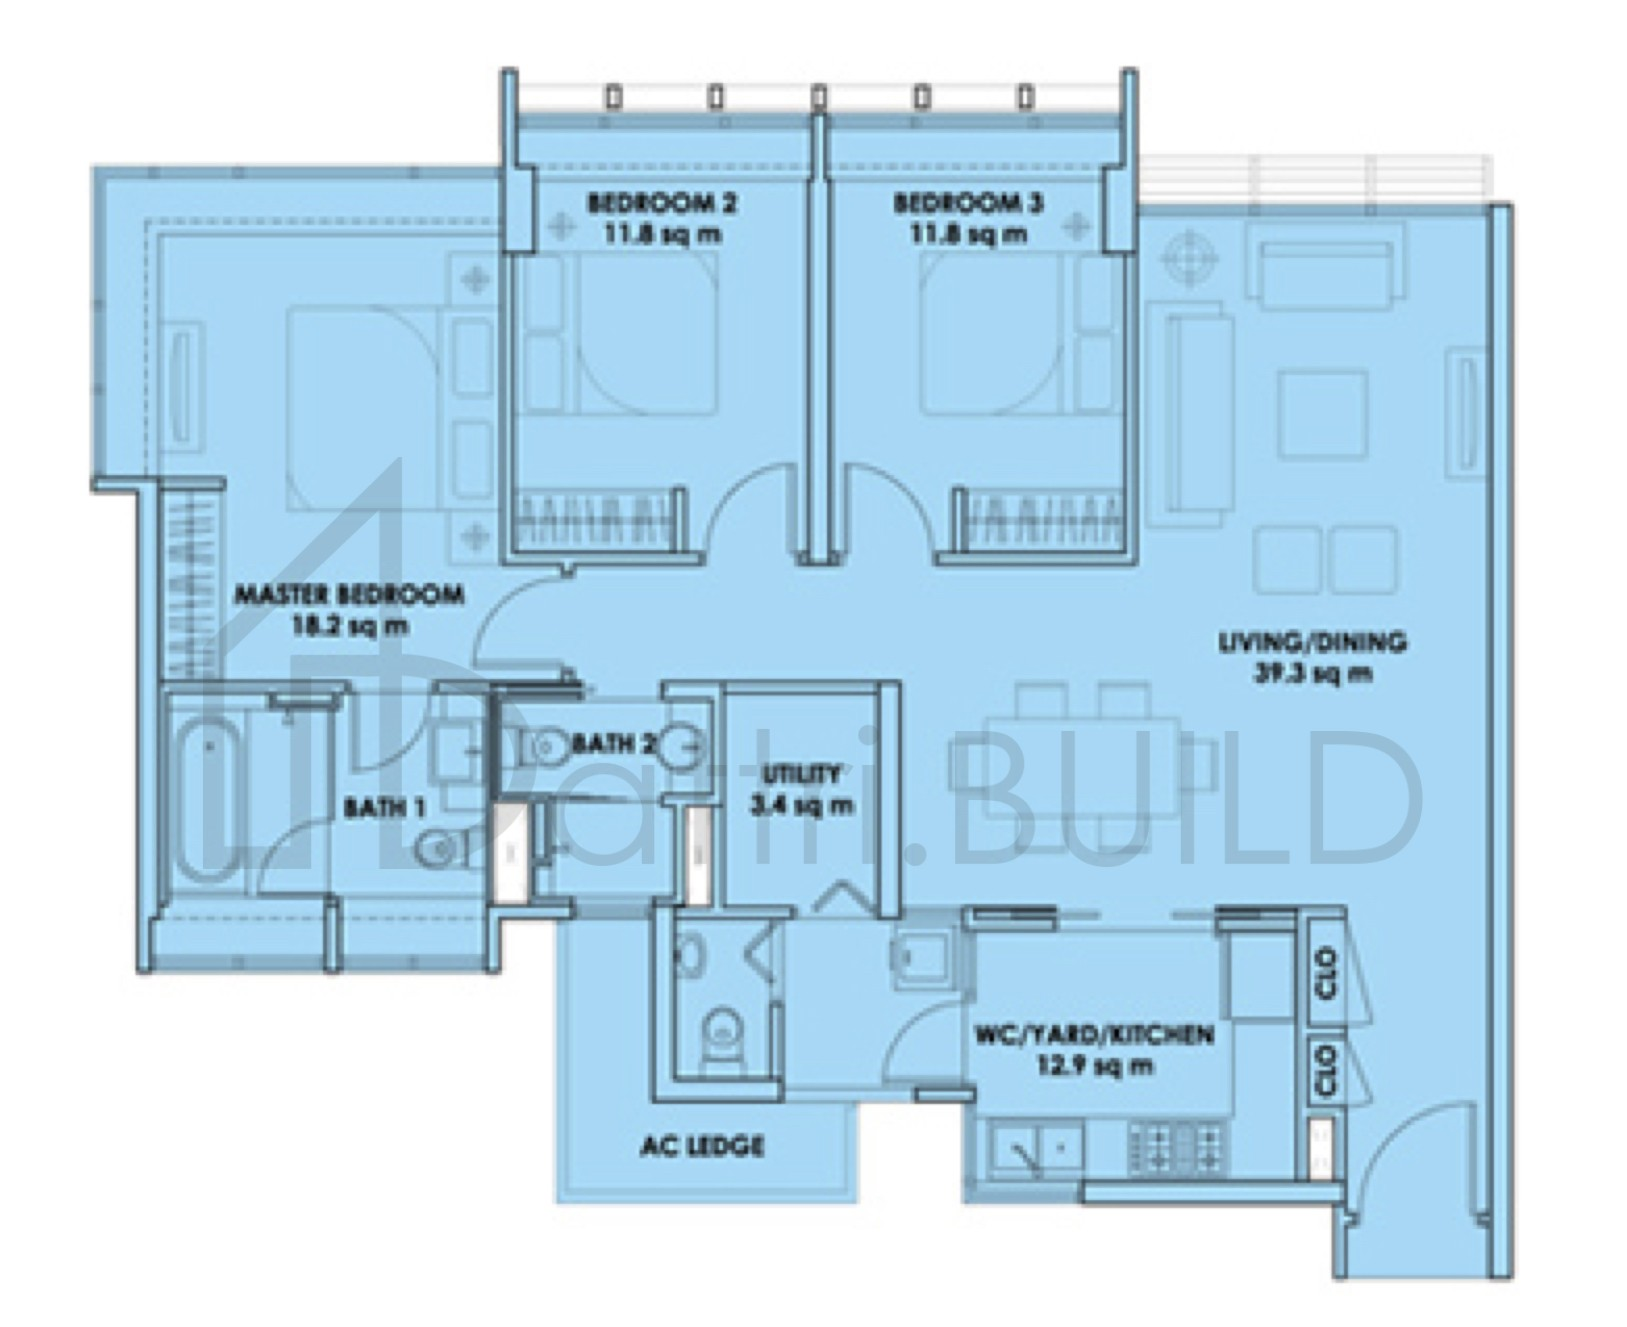 City Square Residences 3 Bedroom Type C1j